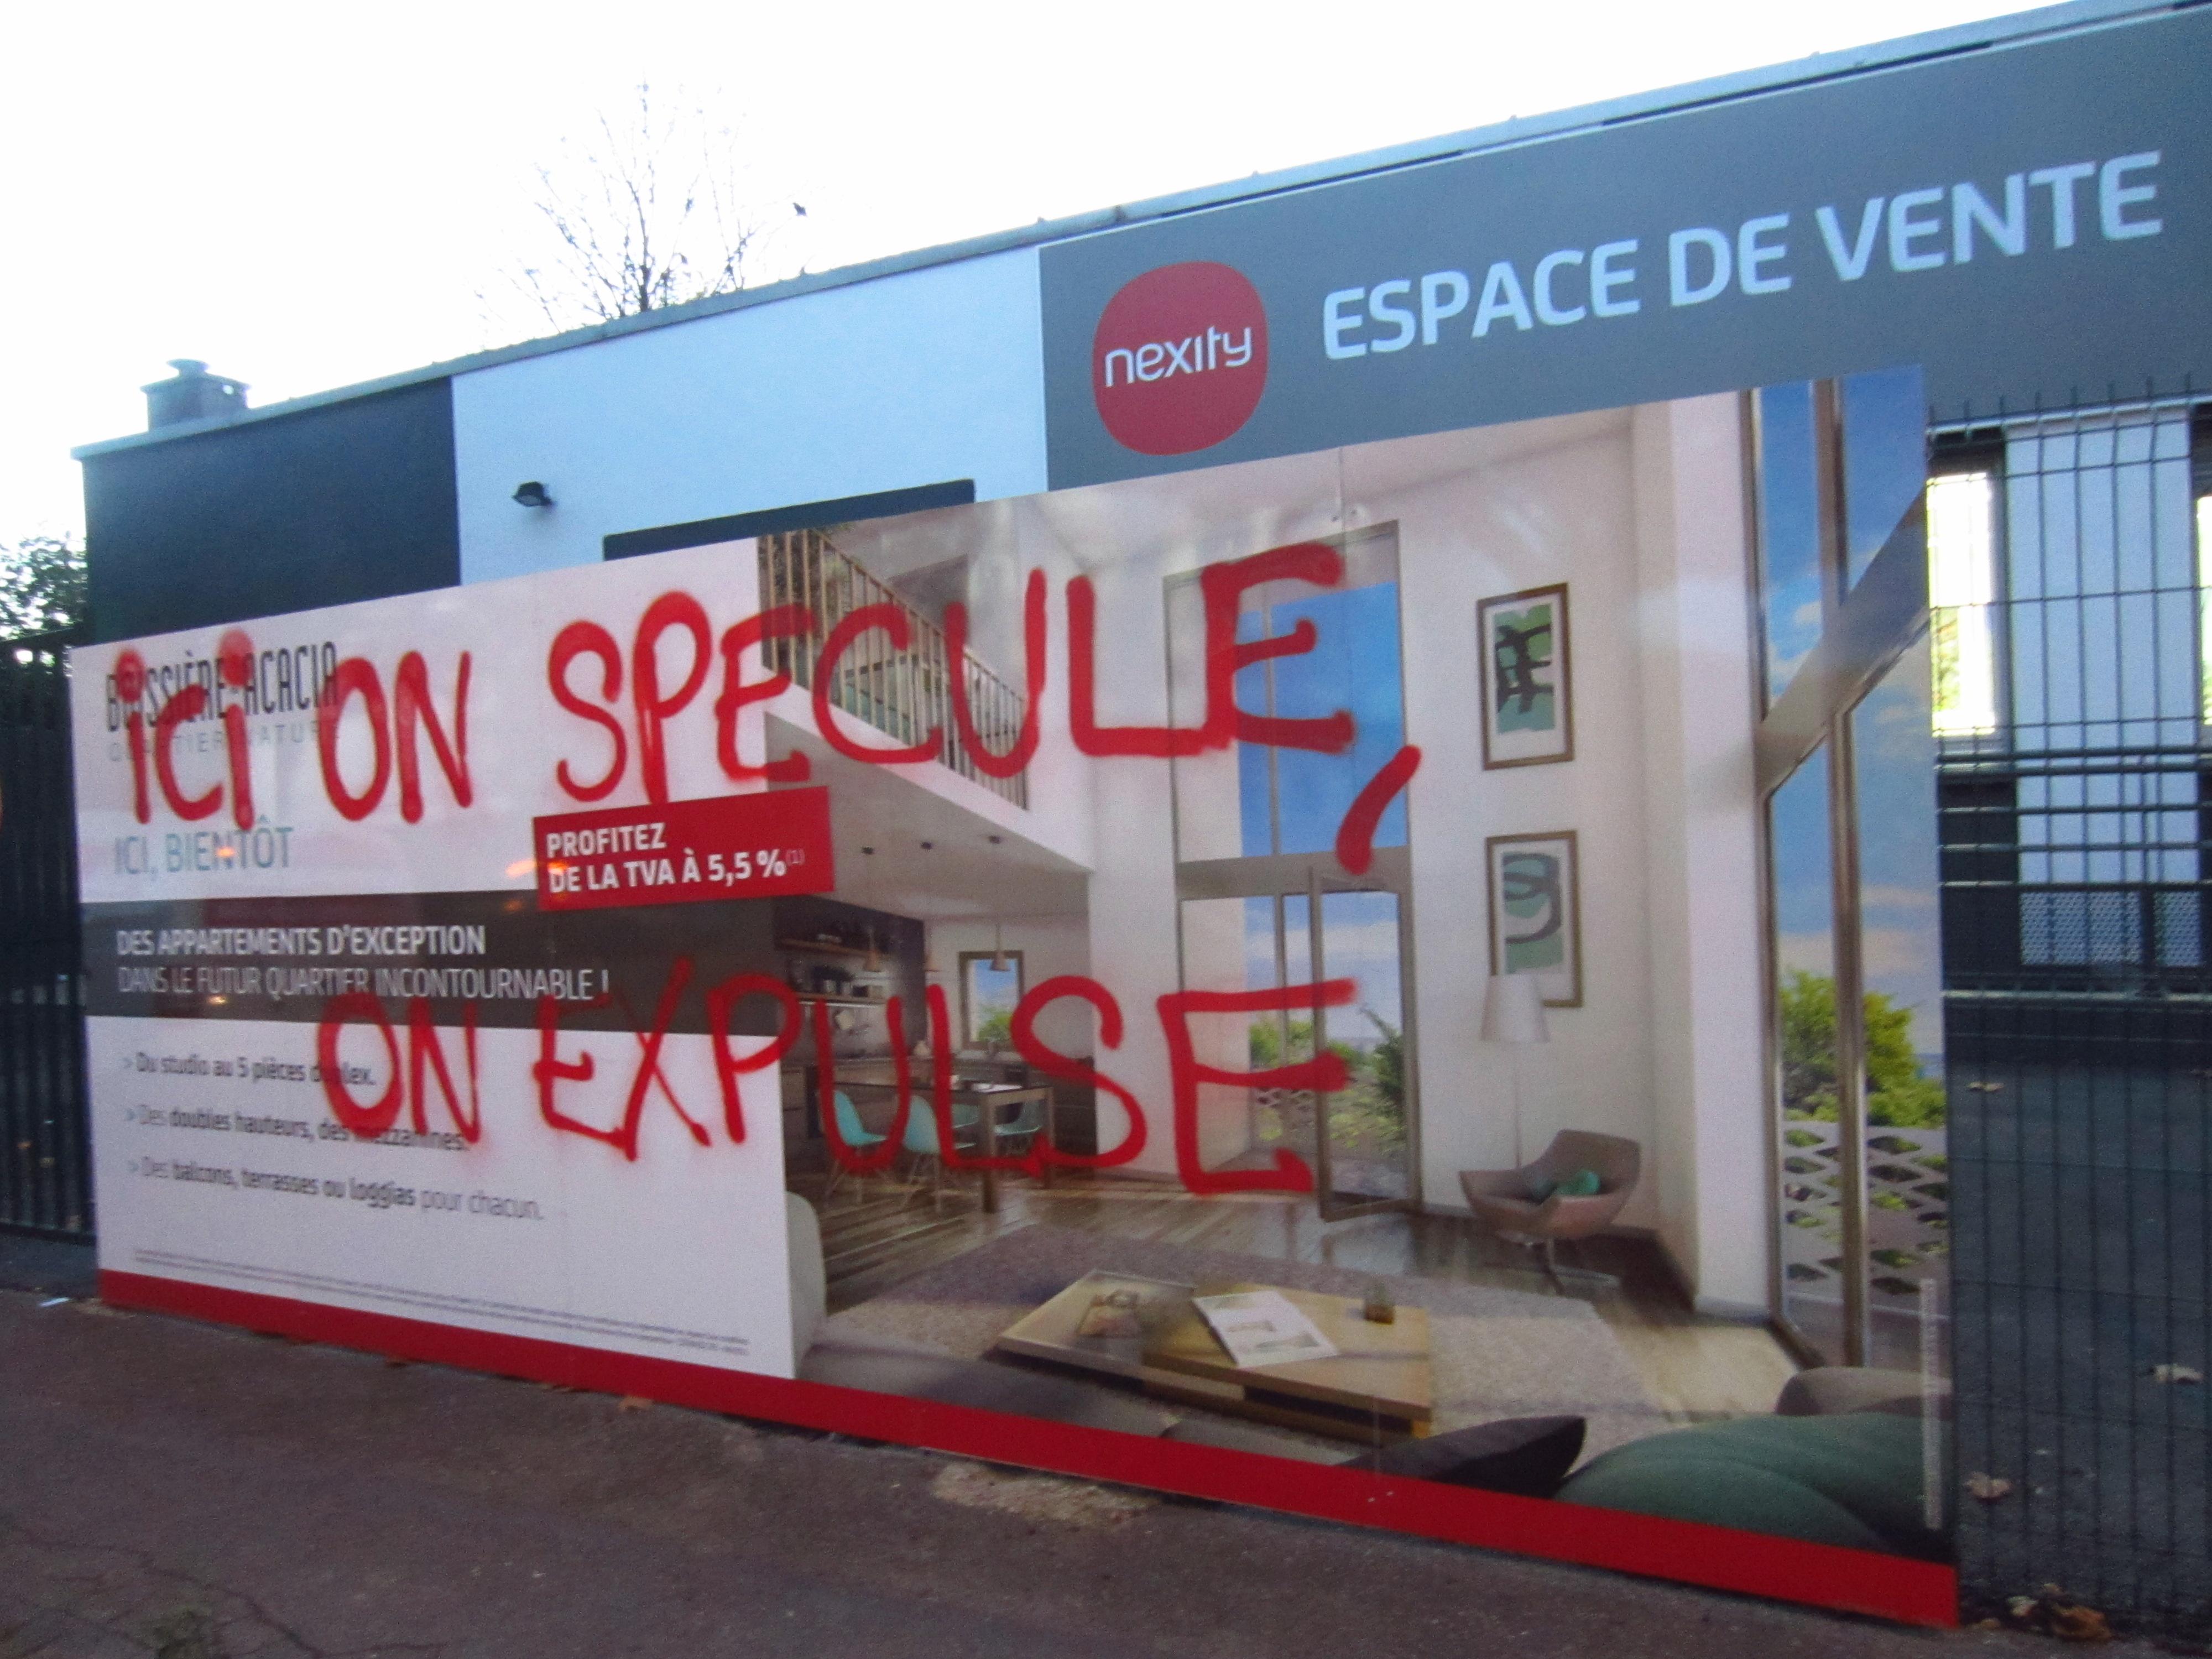 2015-10-30_Montreuil_LaBoissiere-75-Nexity